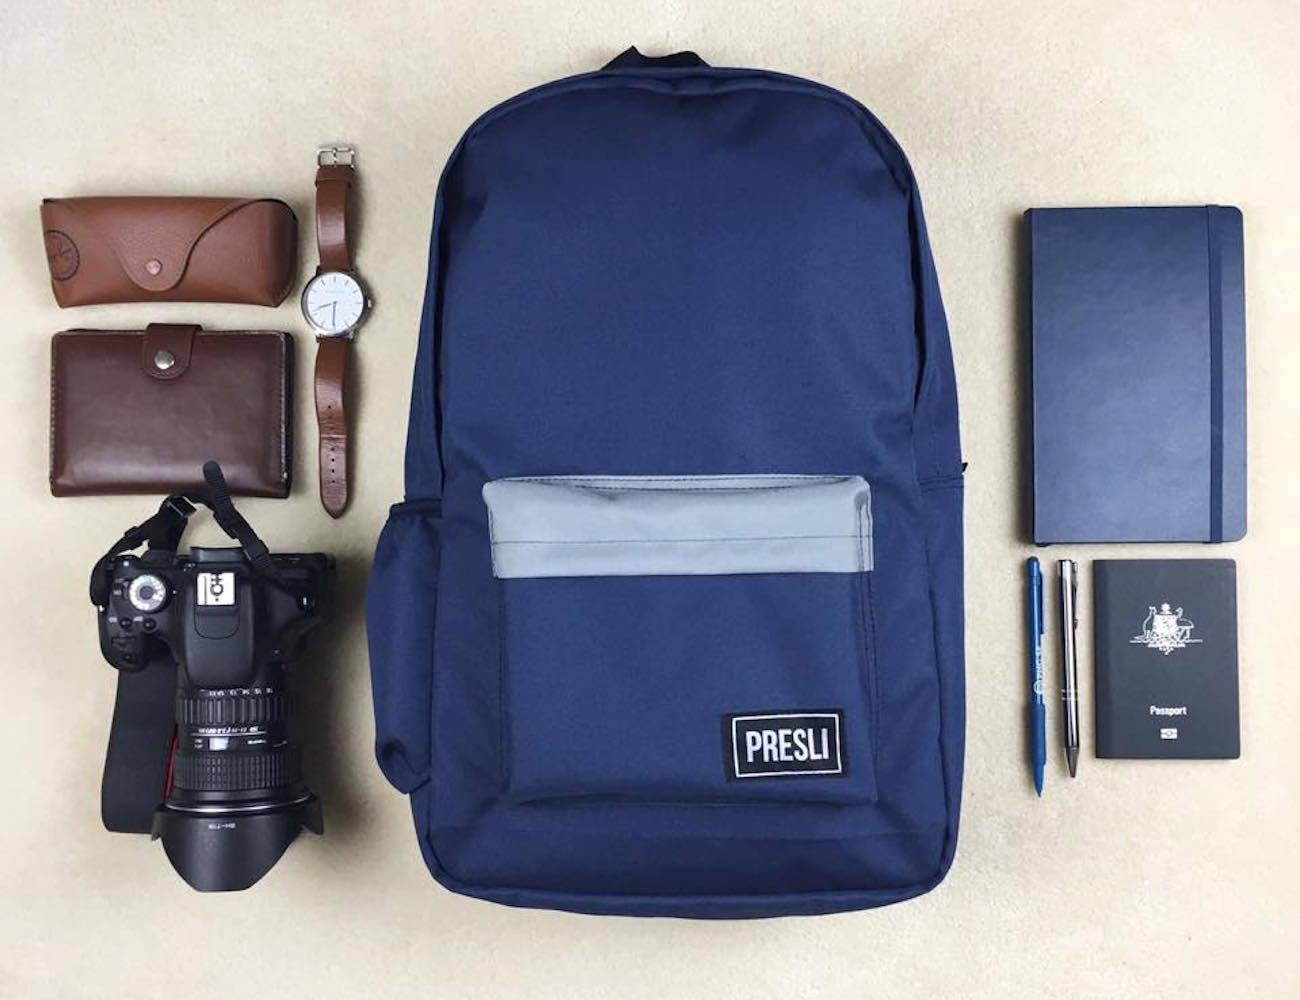 Presli – The Smartest Anti-Theft Backpack